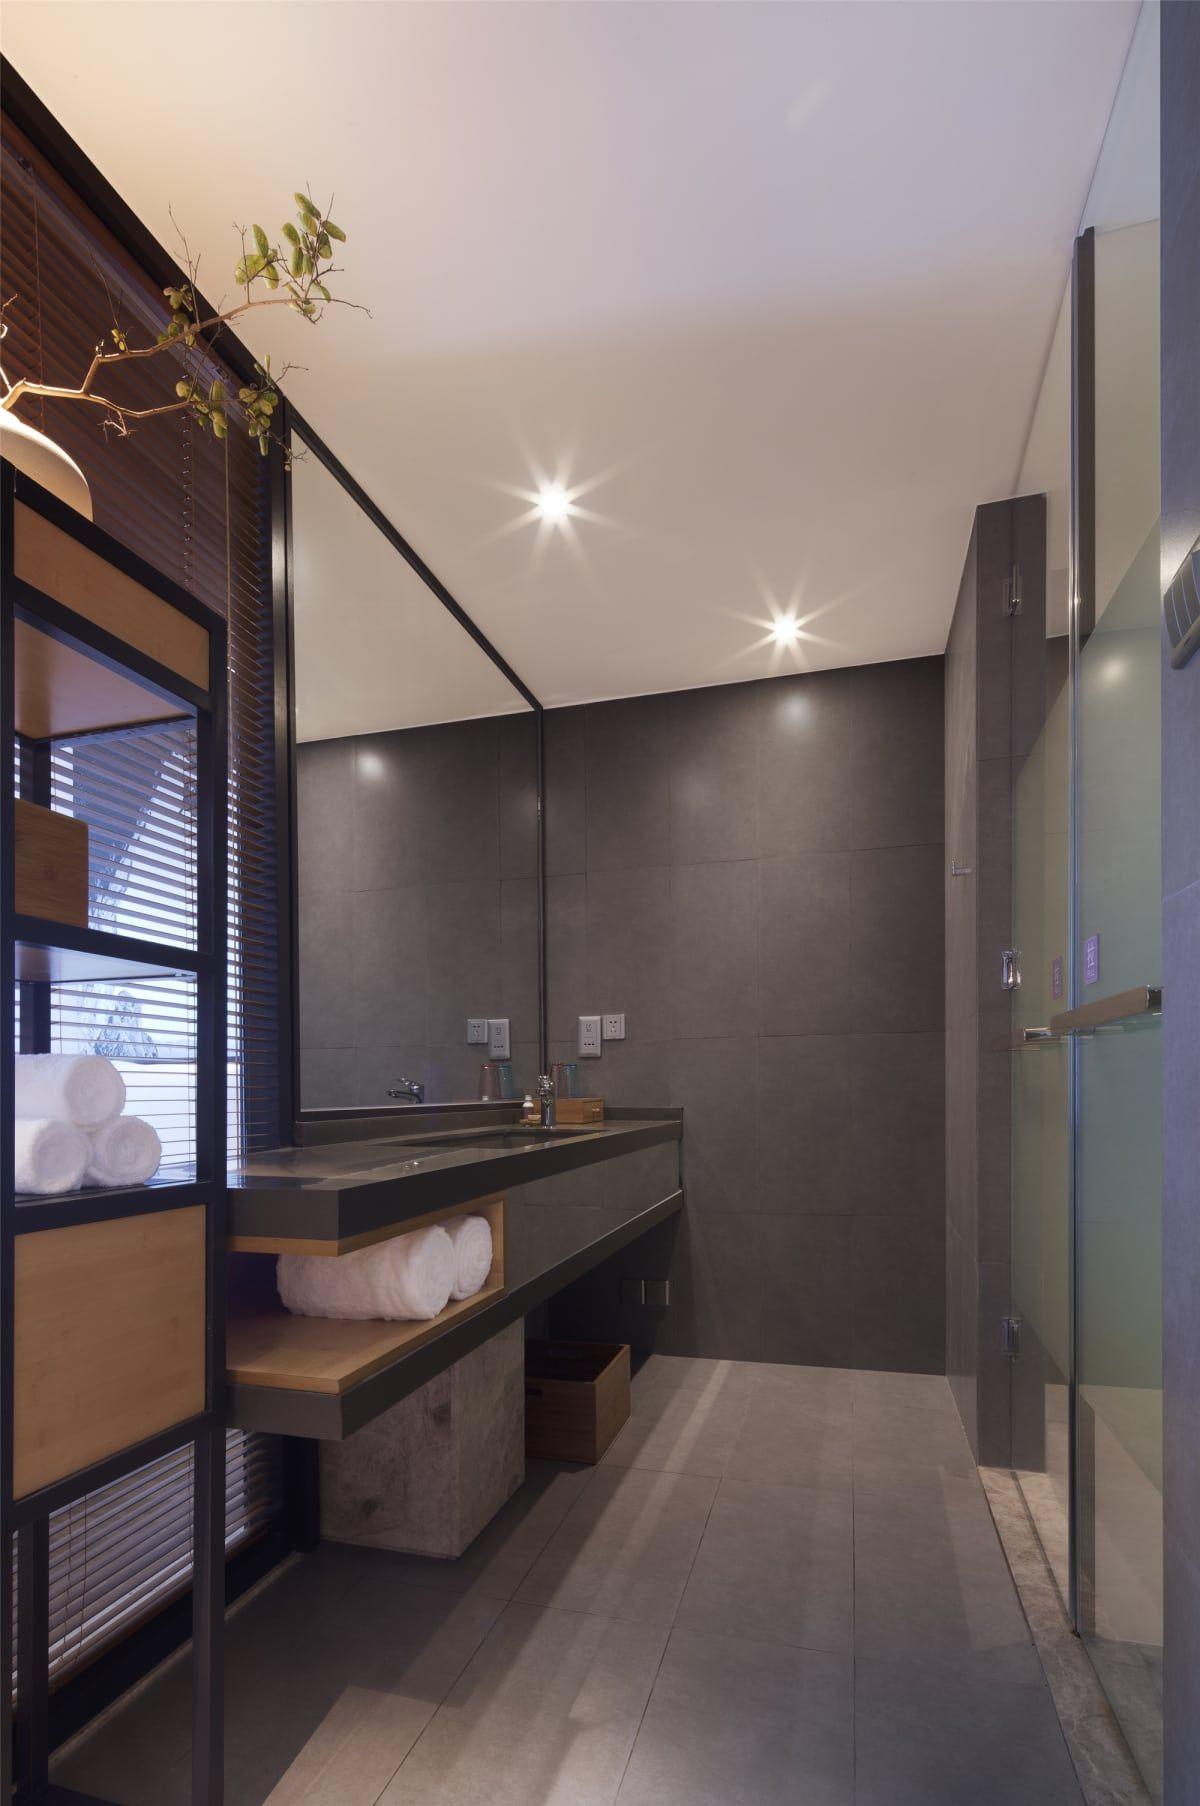 Shenzhen Rongor Design & Consultant Co., Ltd · Shenzhen Seven-Star Bay Yacht Club - White Sail Hotel